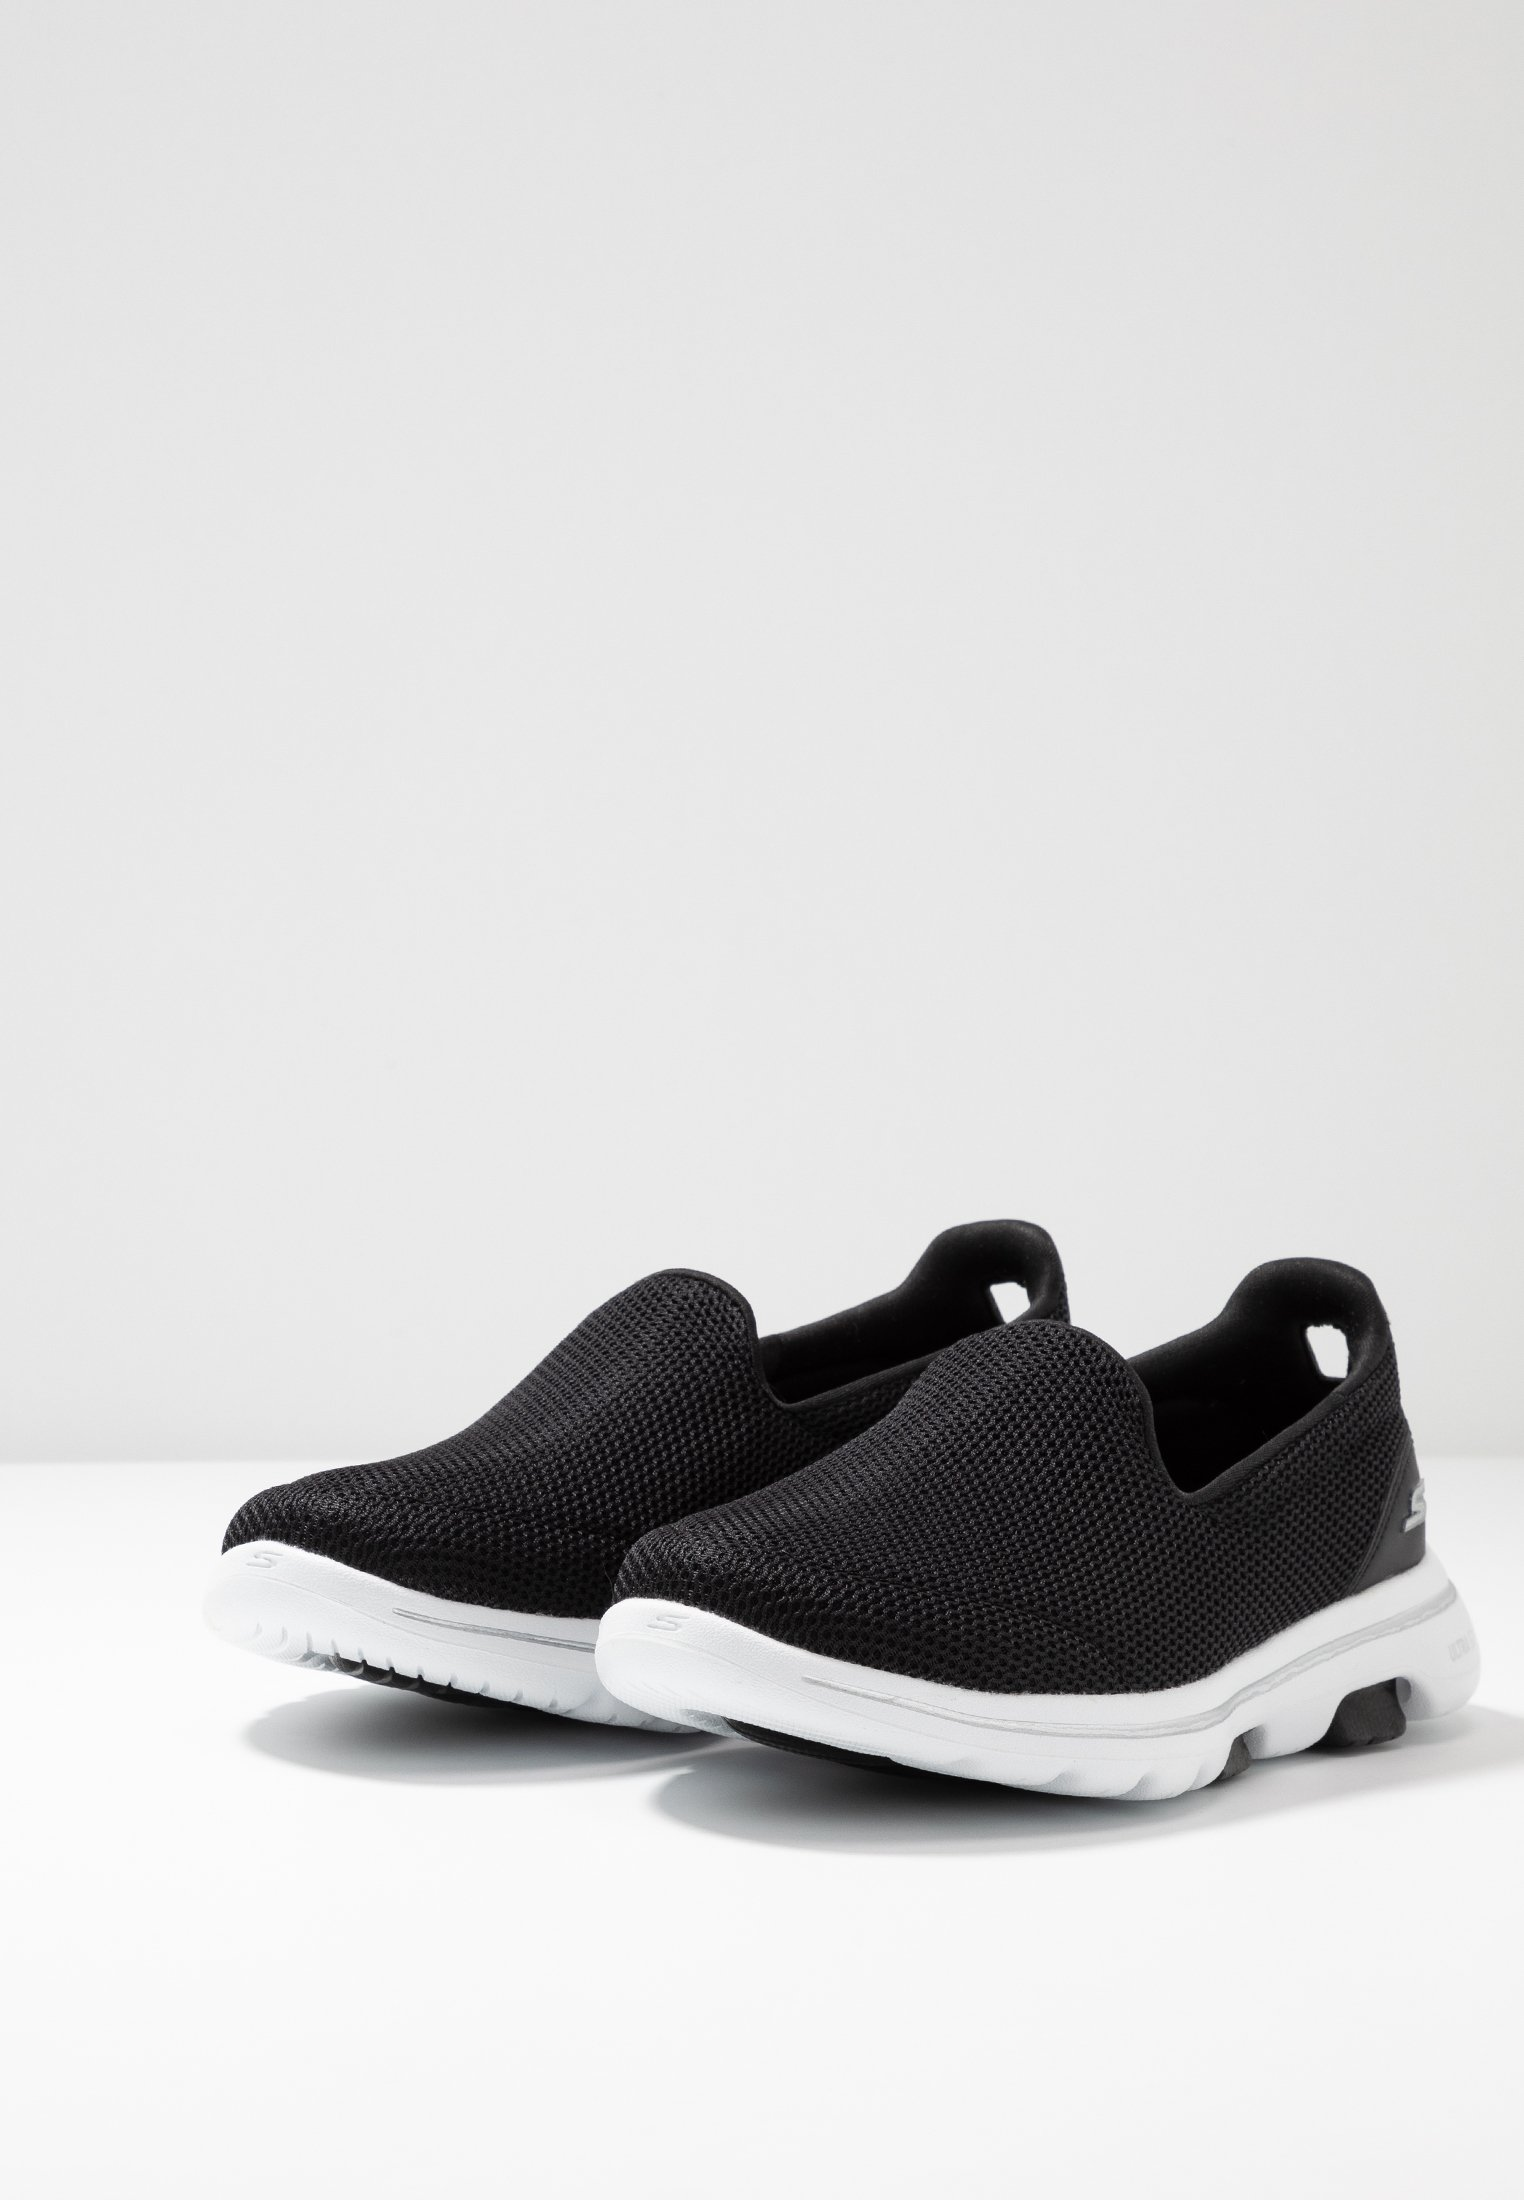 Skechers Performance Go Walk 5 - Sportieve Wandelschoenen Black/white Iz0xDxn8